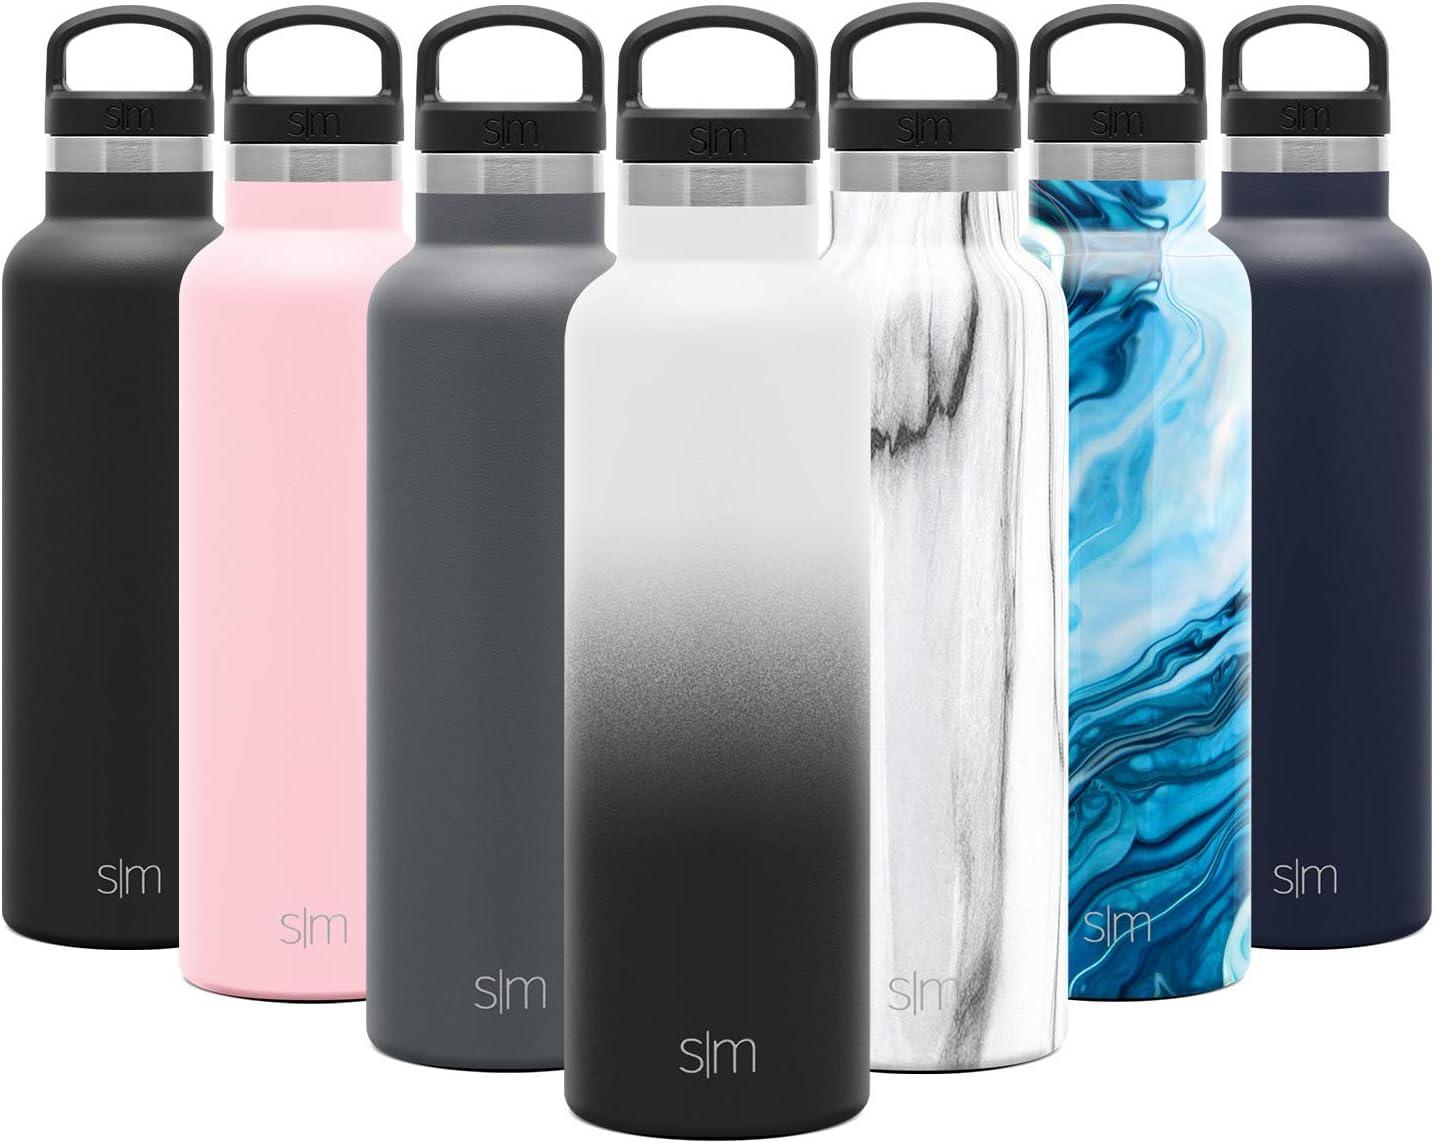 Simple Modern 590mL Ascent Termo Botella de Agua de Acero Inoxidable con Tapa de Asa, Botella termica con Boca Estrecha, aislada al vacío, Doble Pared, sin BPA para Deporte o Viaje, Prueba de Fugas